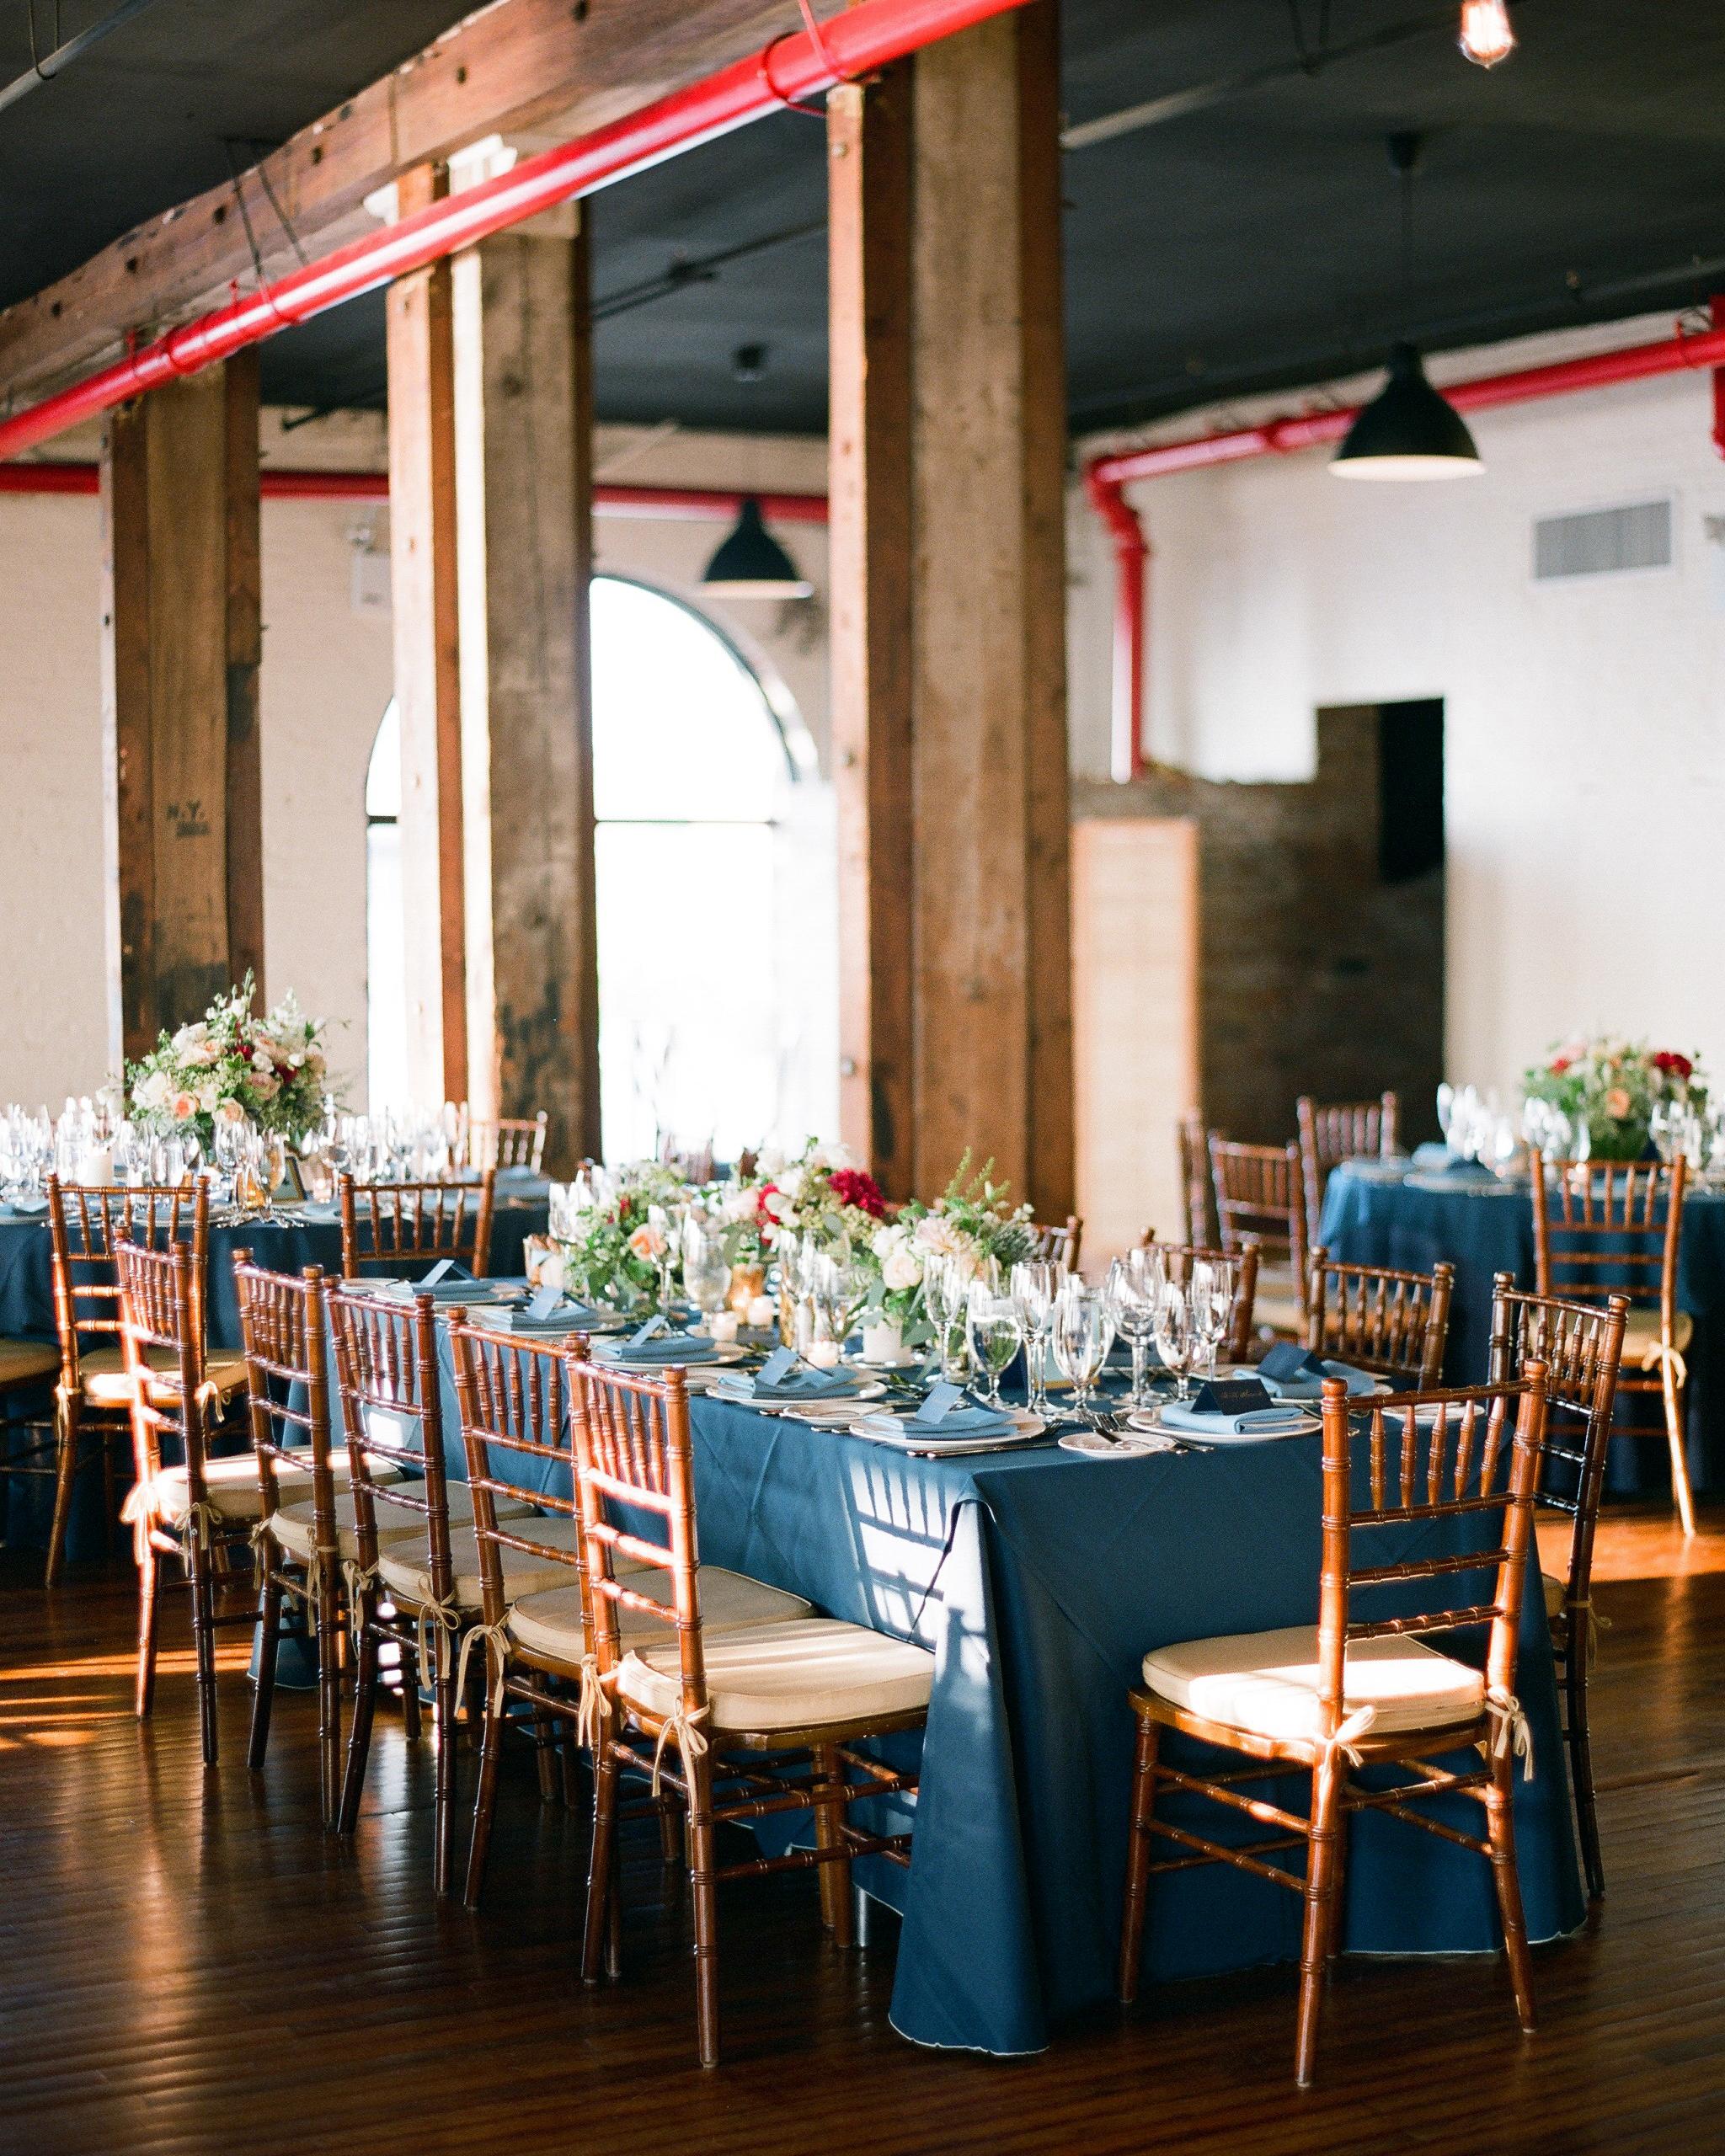 amy-bob-wedding-table-0757-s111884-0715.jpg